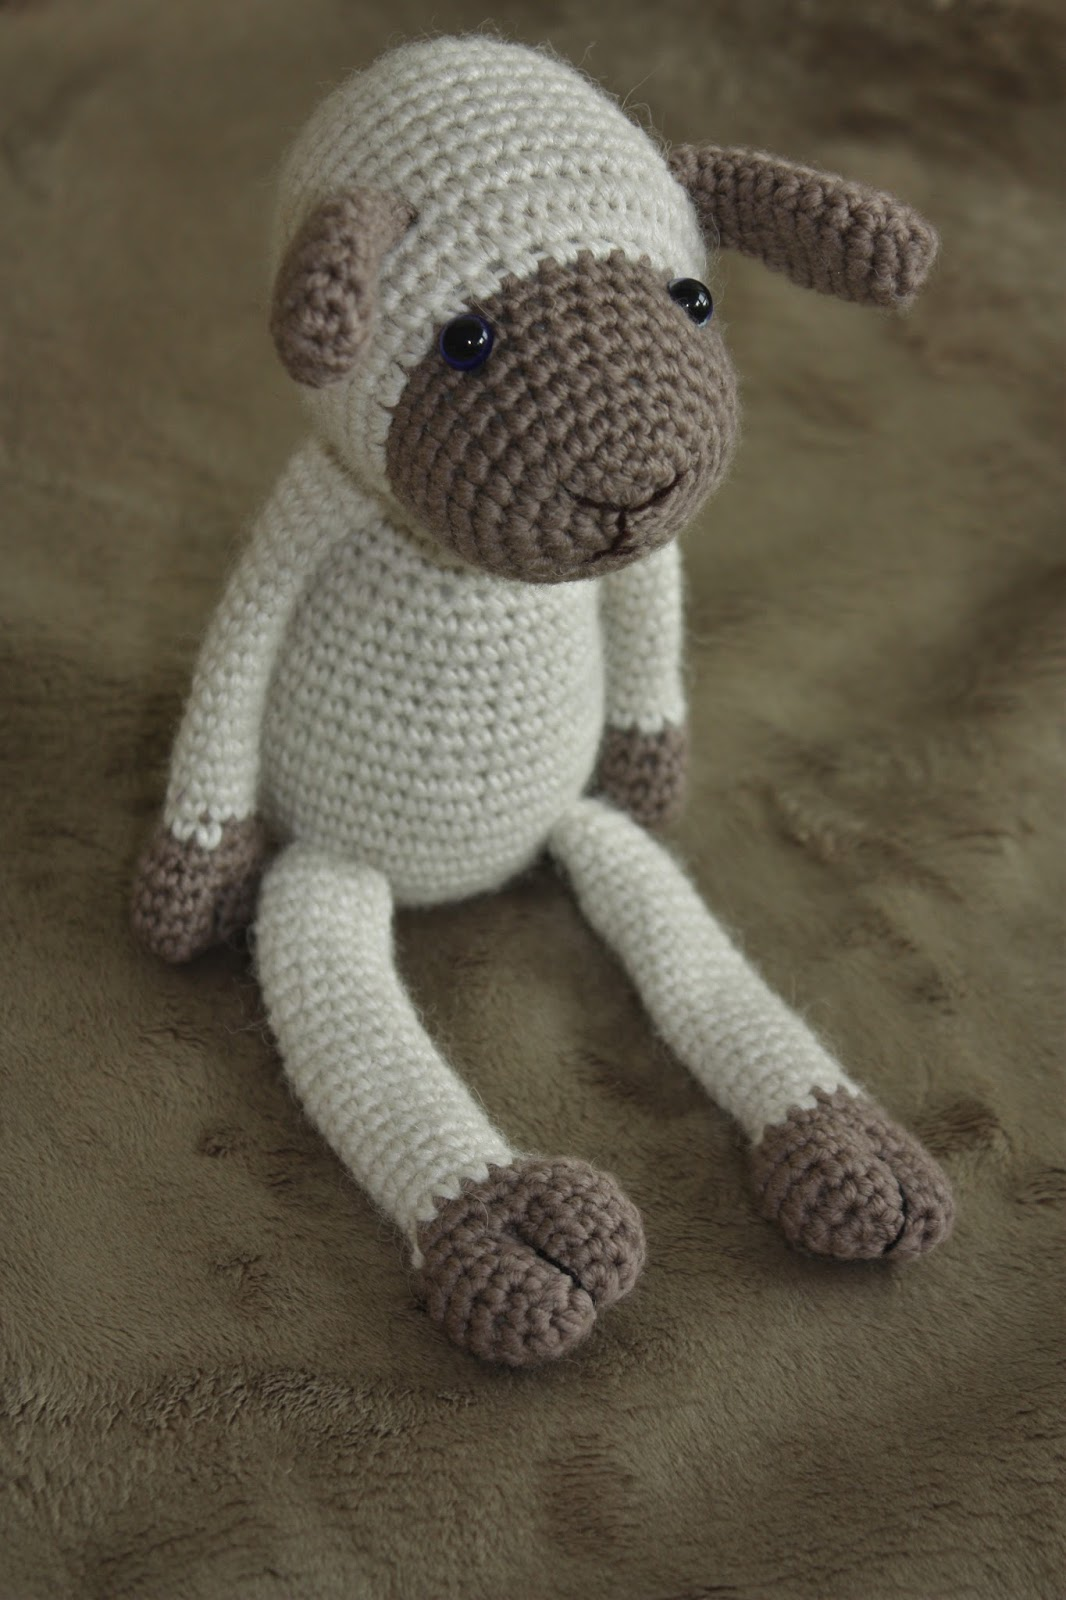 Amigurumi Lamb Pattern : Happyamigurumi: New Amigurumi Sheep Pattern